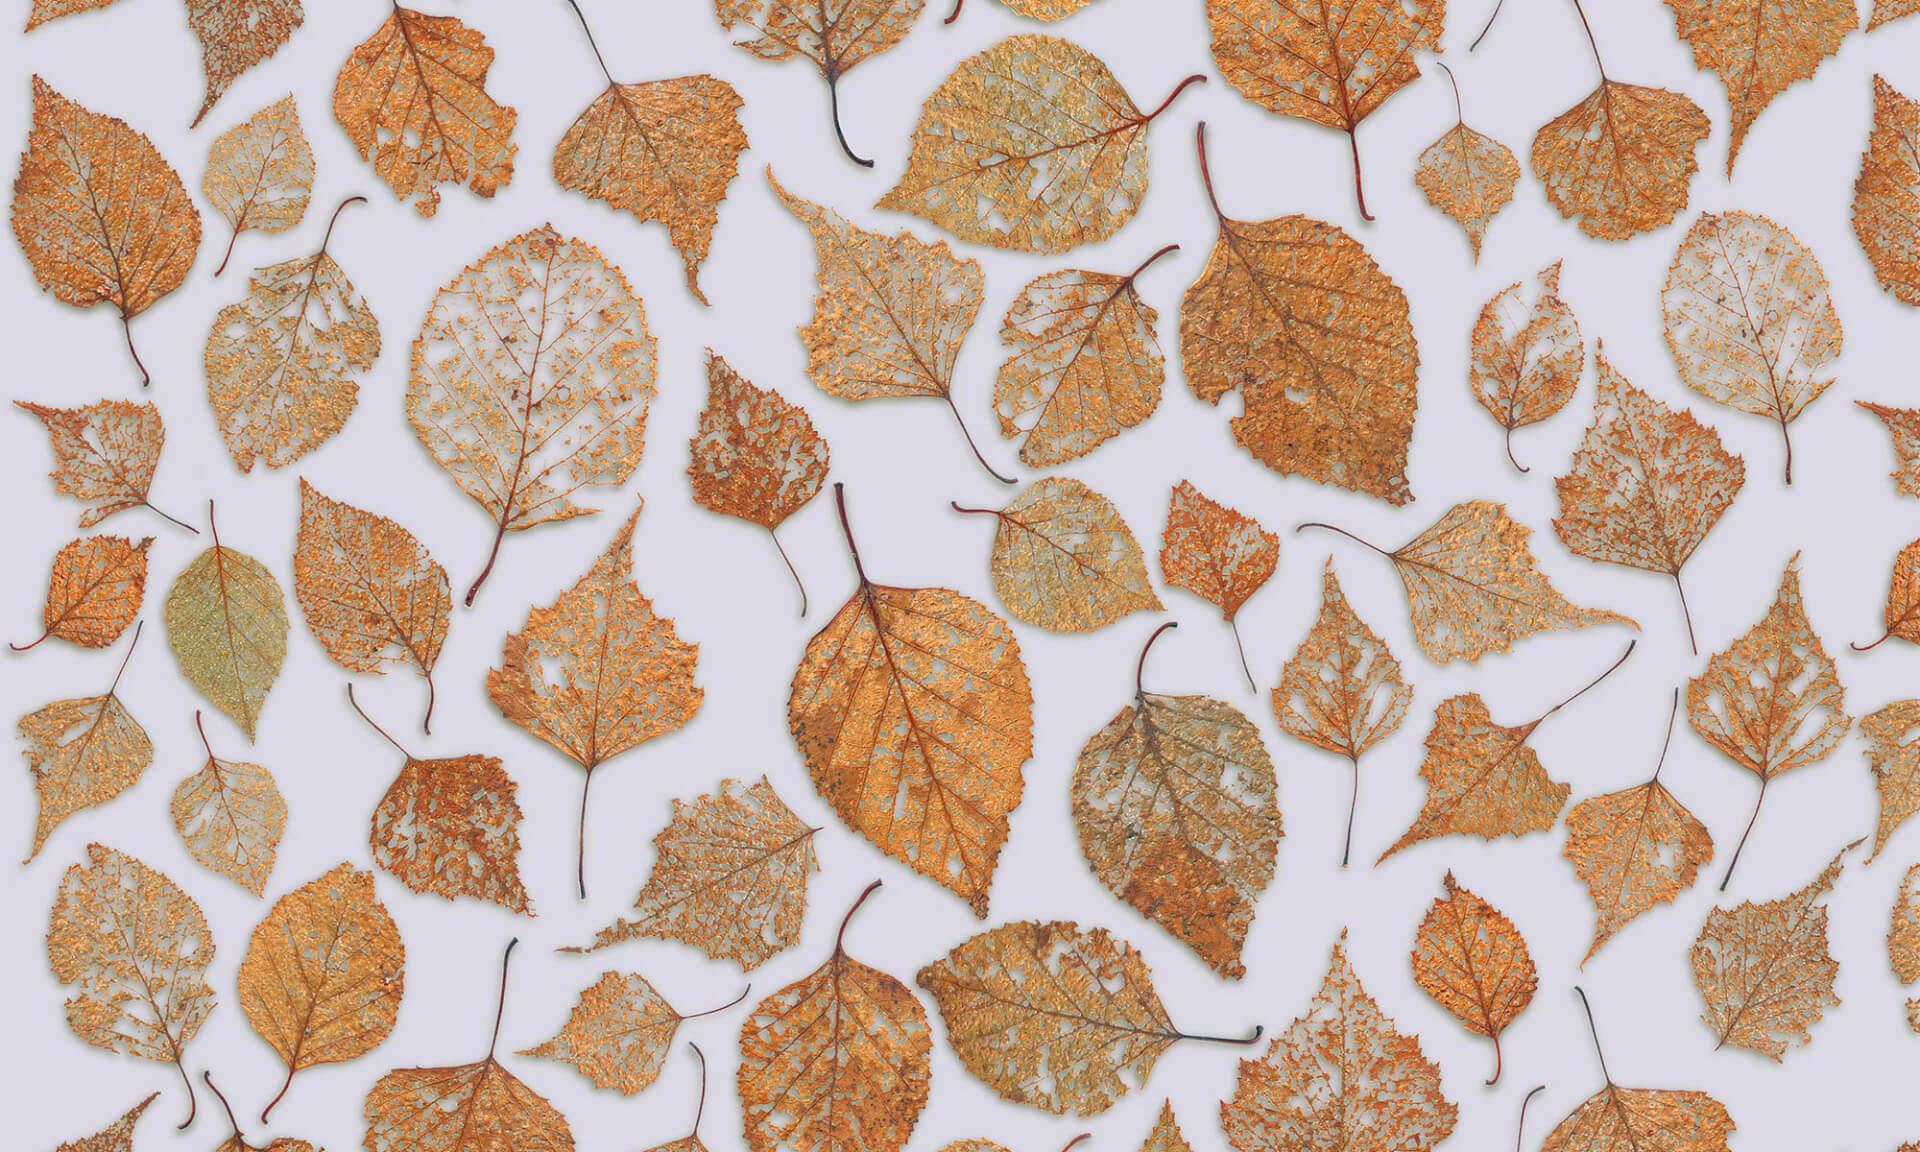 Fall Foliage Computer Wallpaper Zo 235 Design Nature Wallpaper All Things Natural For Walls